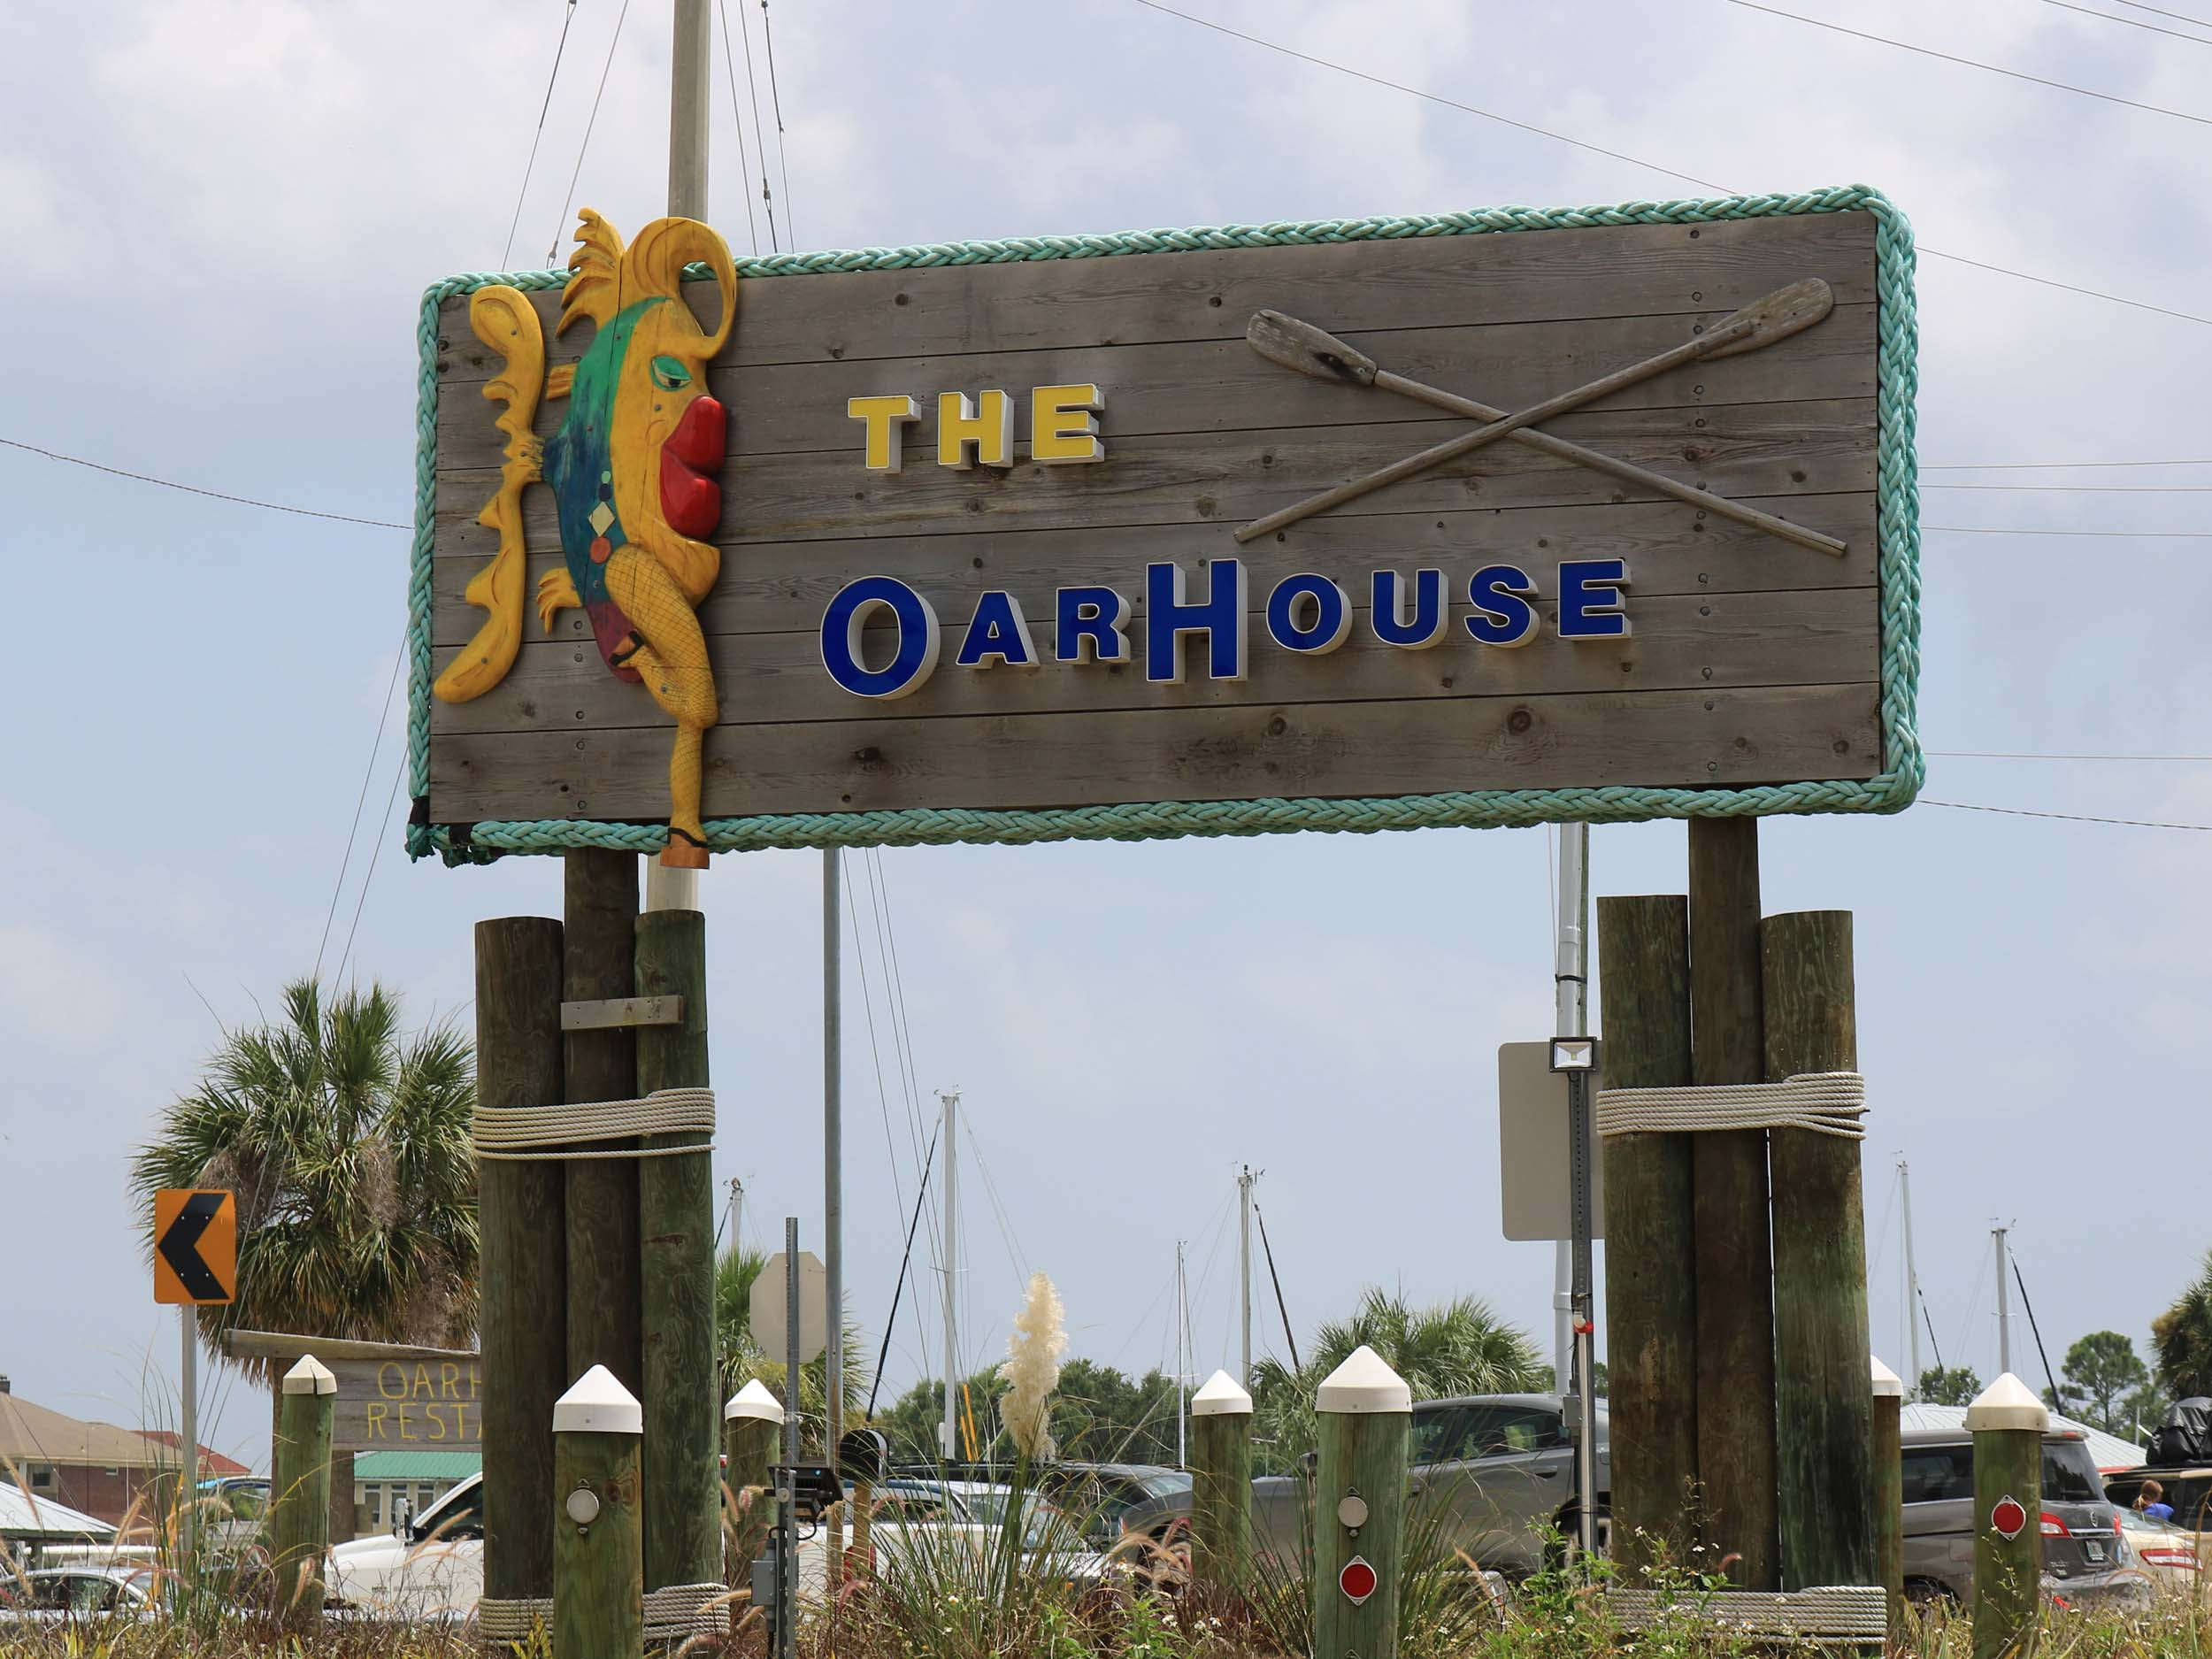 The Oar House Sign